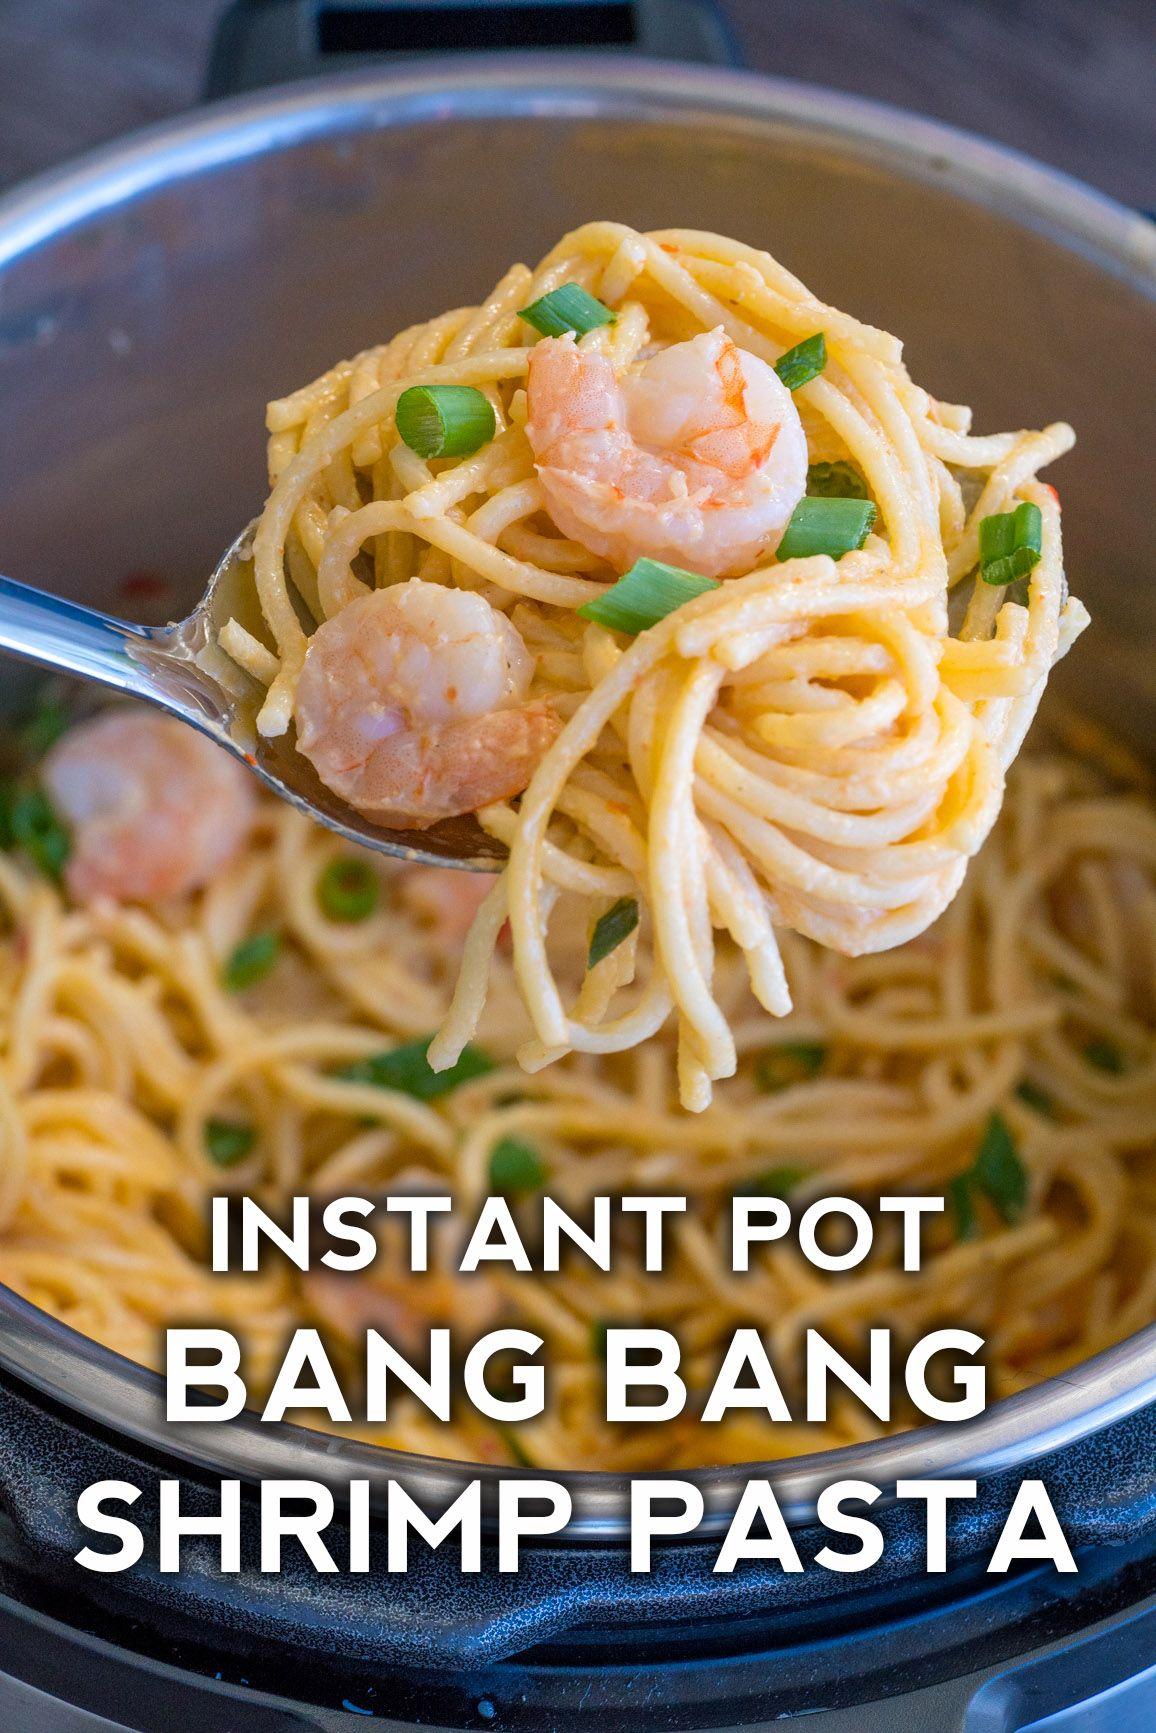 Instant Pot Bang Bang Shrimp Pasta